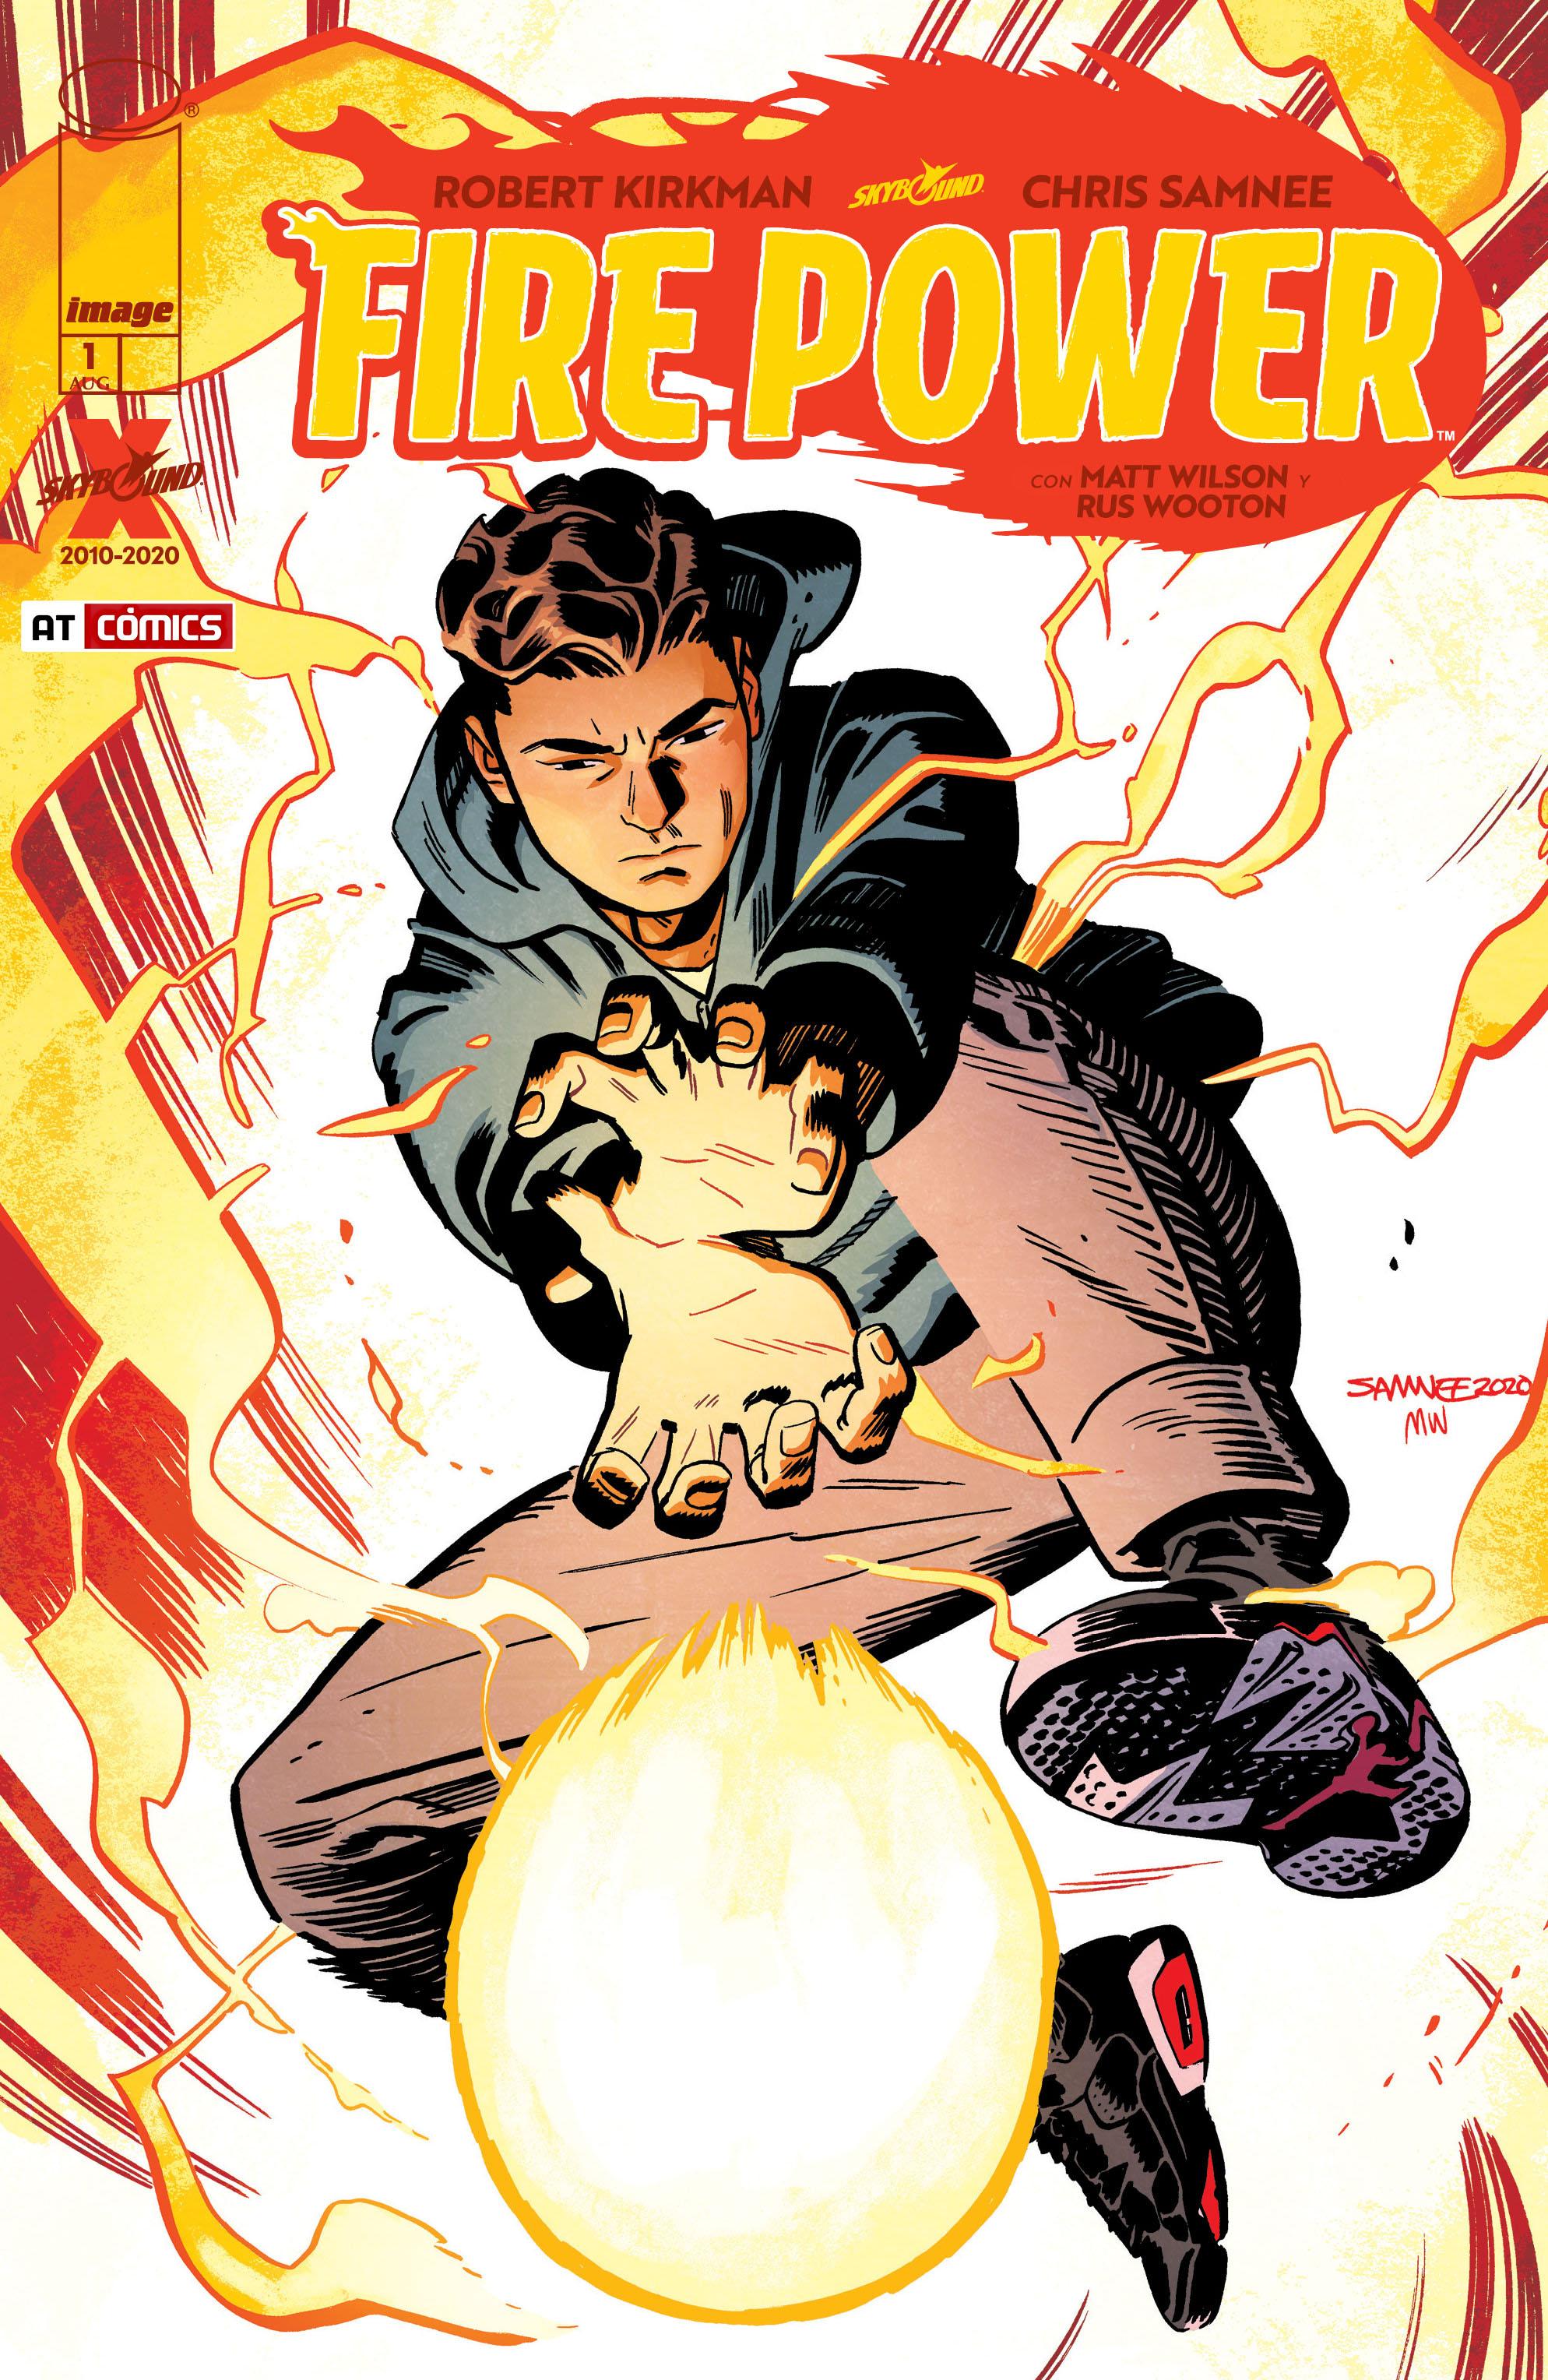 Fire Power By Kirkman & Samnee 001-000.jpg